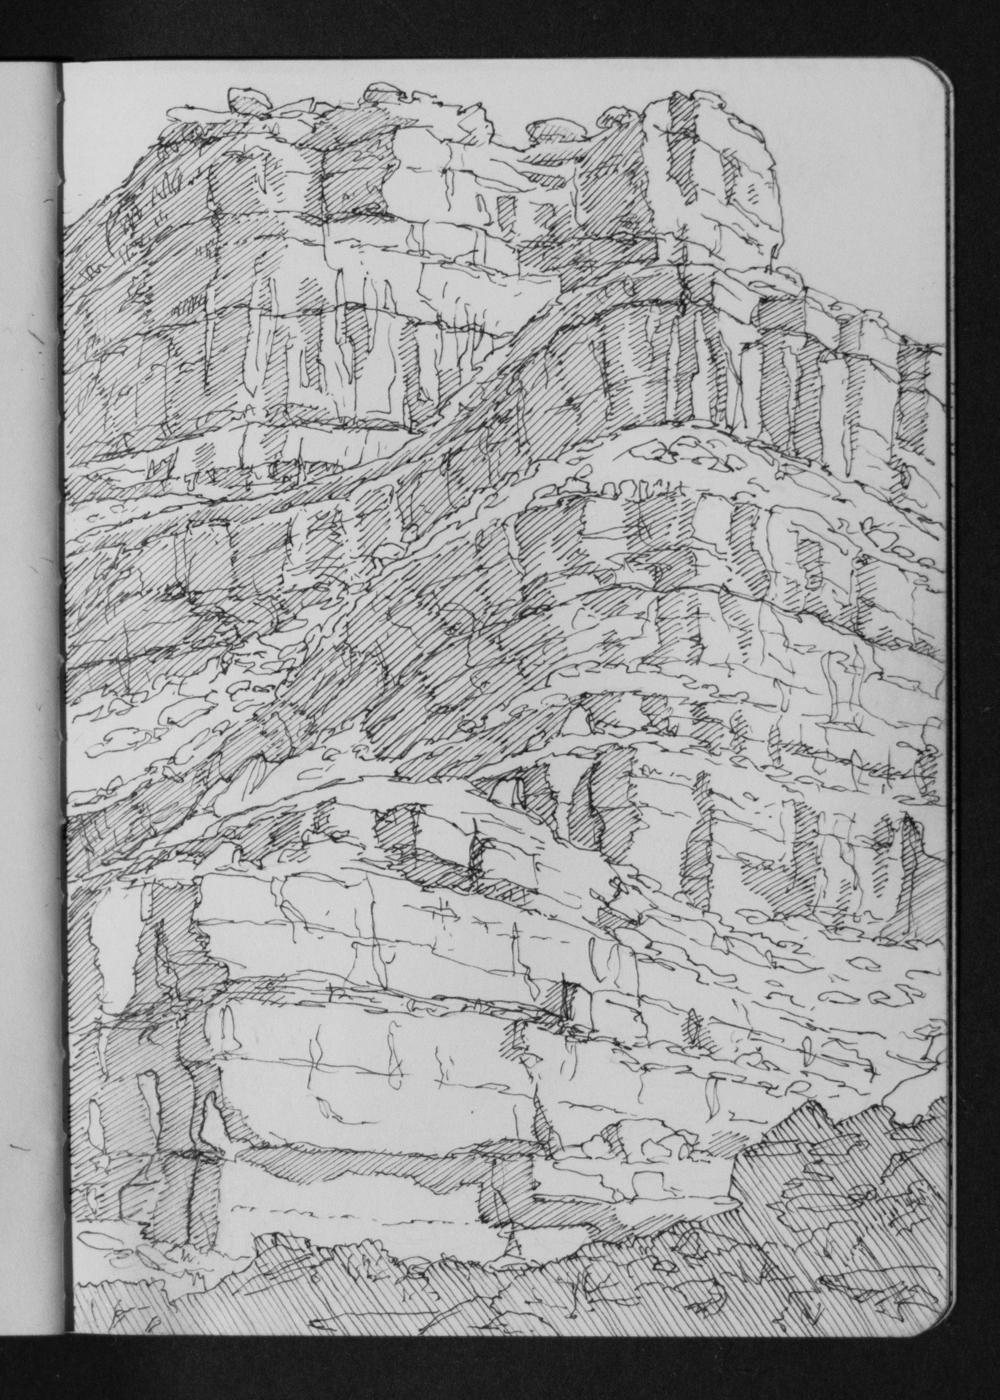 04-20 San Juan Slickhorn Canyon Mouth Northern Walls.jpg